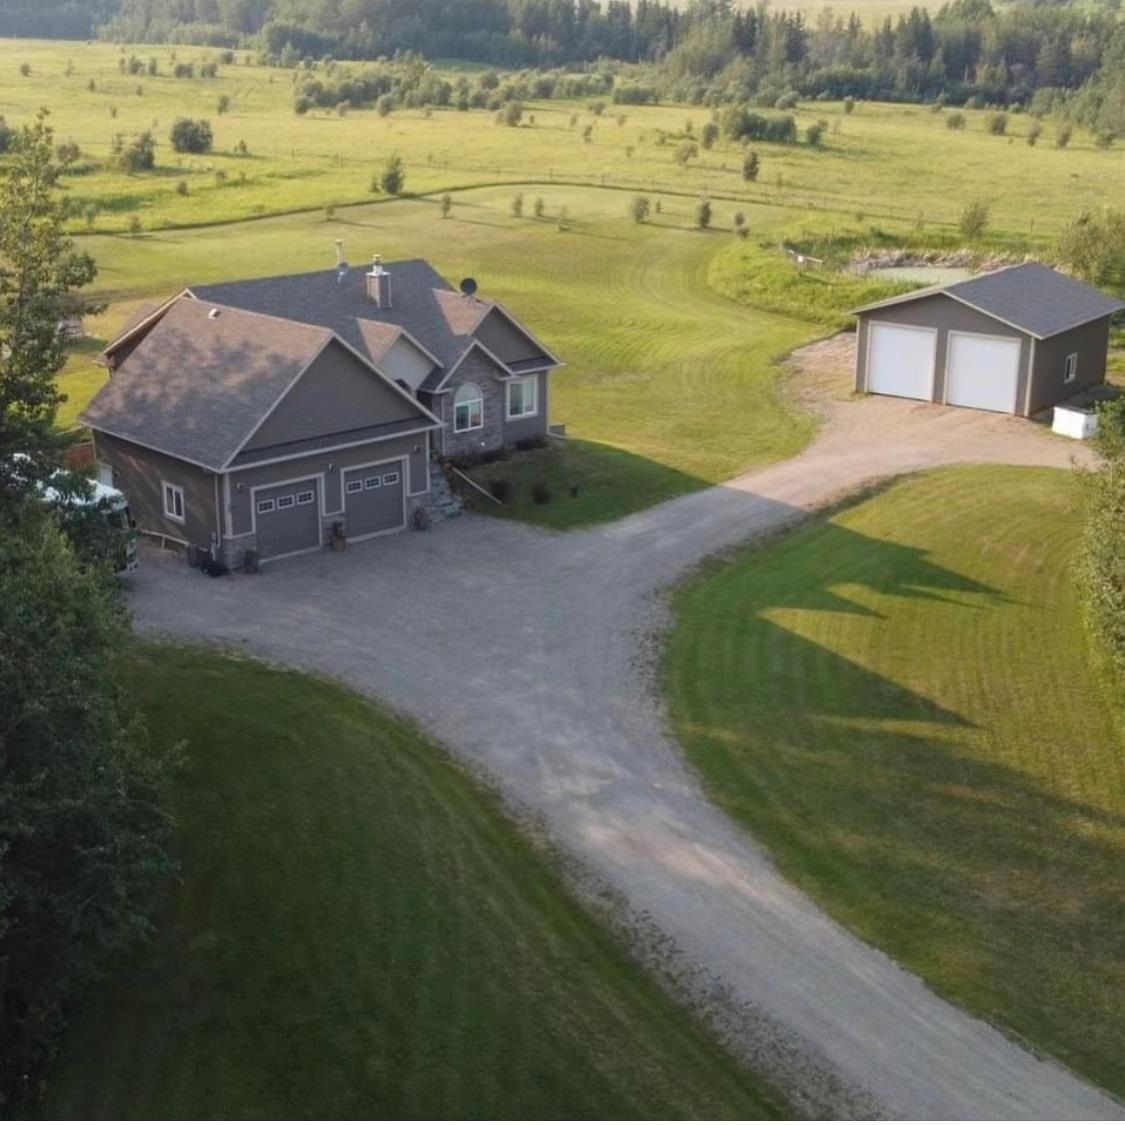 Main Photo: 13464 279 Road: Charlie Lake House for sale (Fort St. John (Zone 60))  : MLS®# R2603460